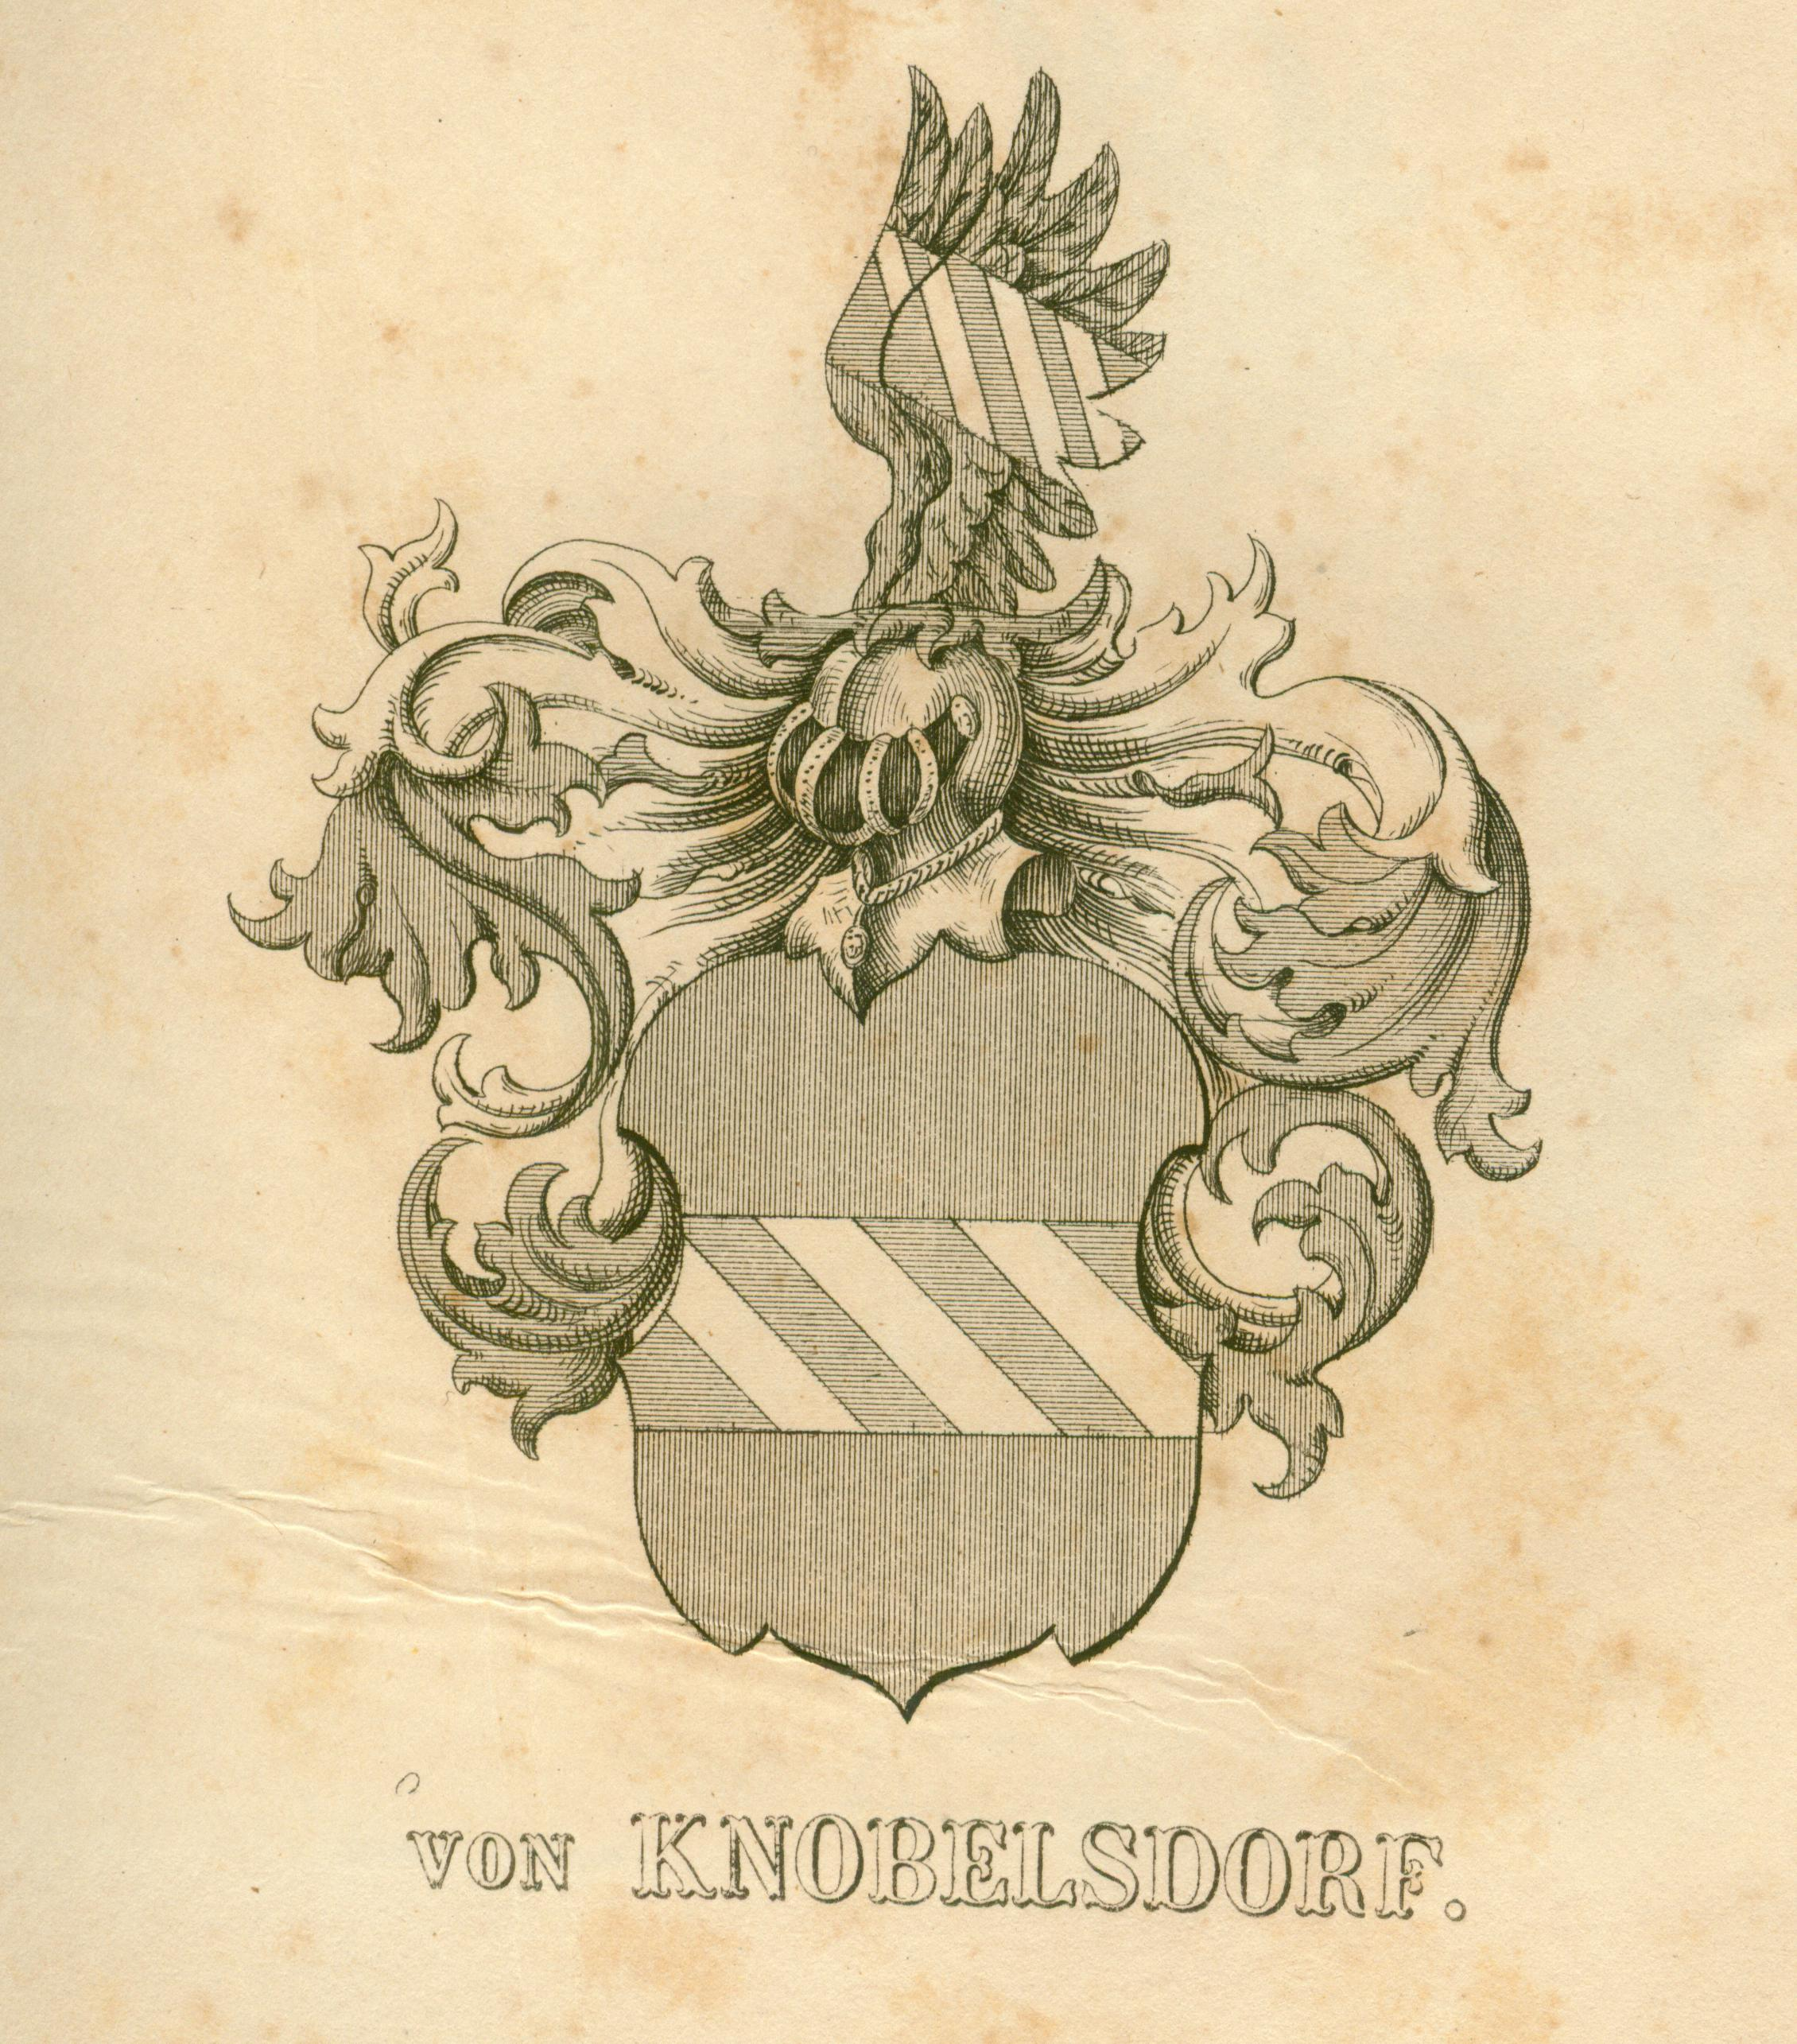 Knobelsdorf